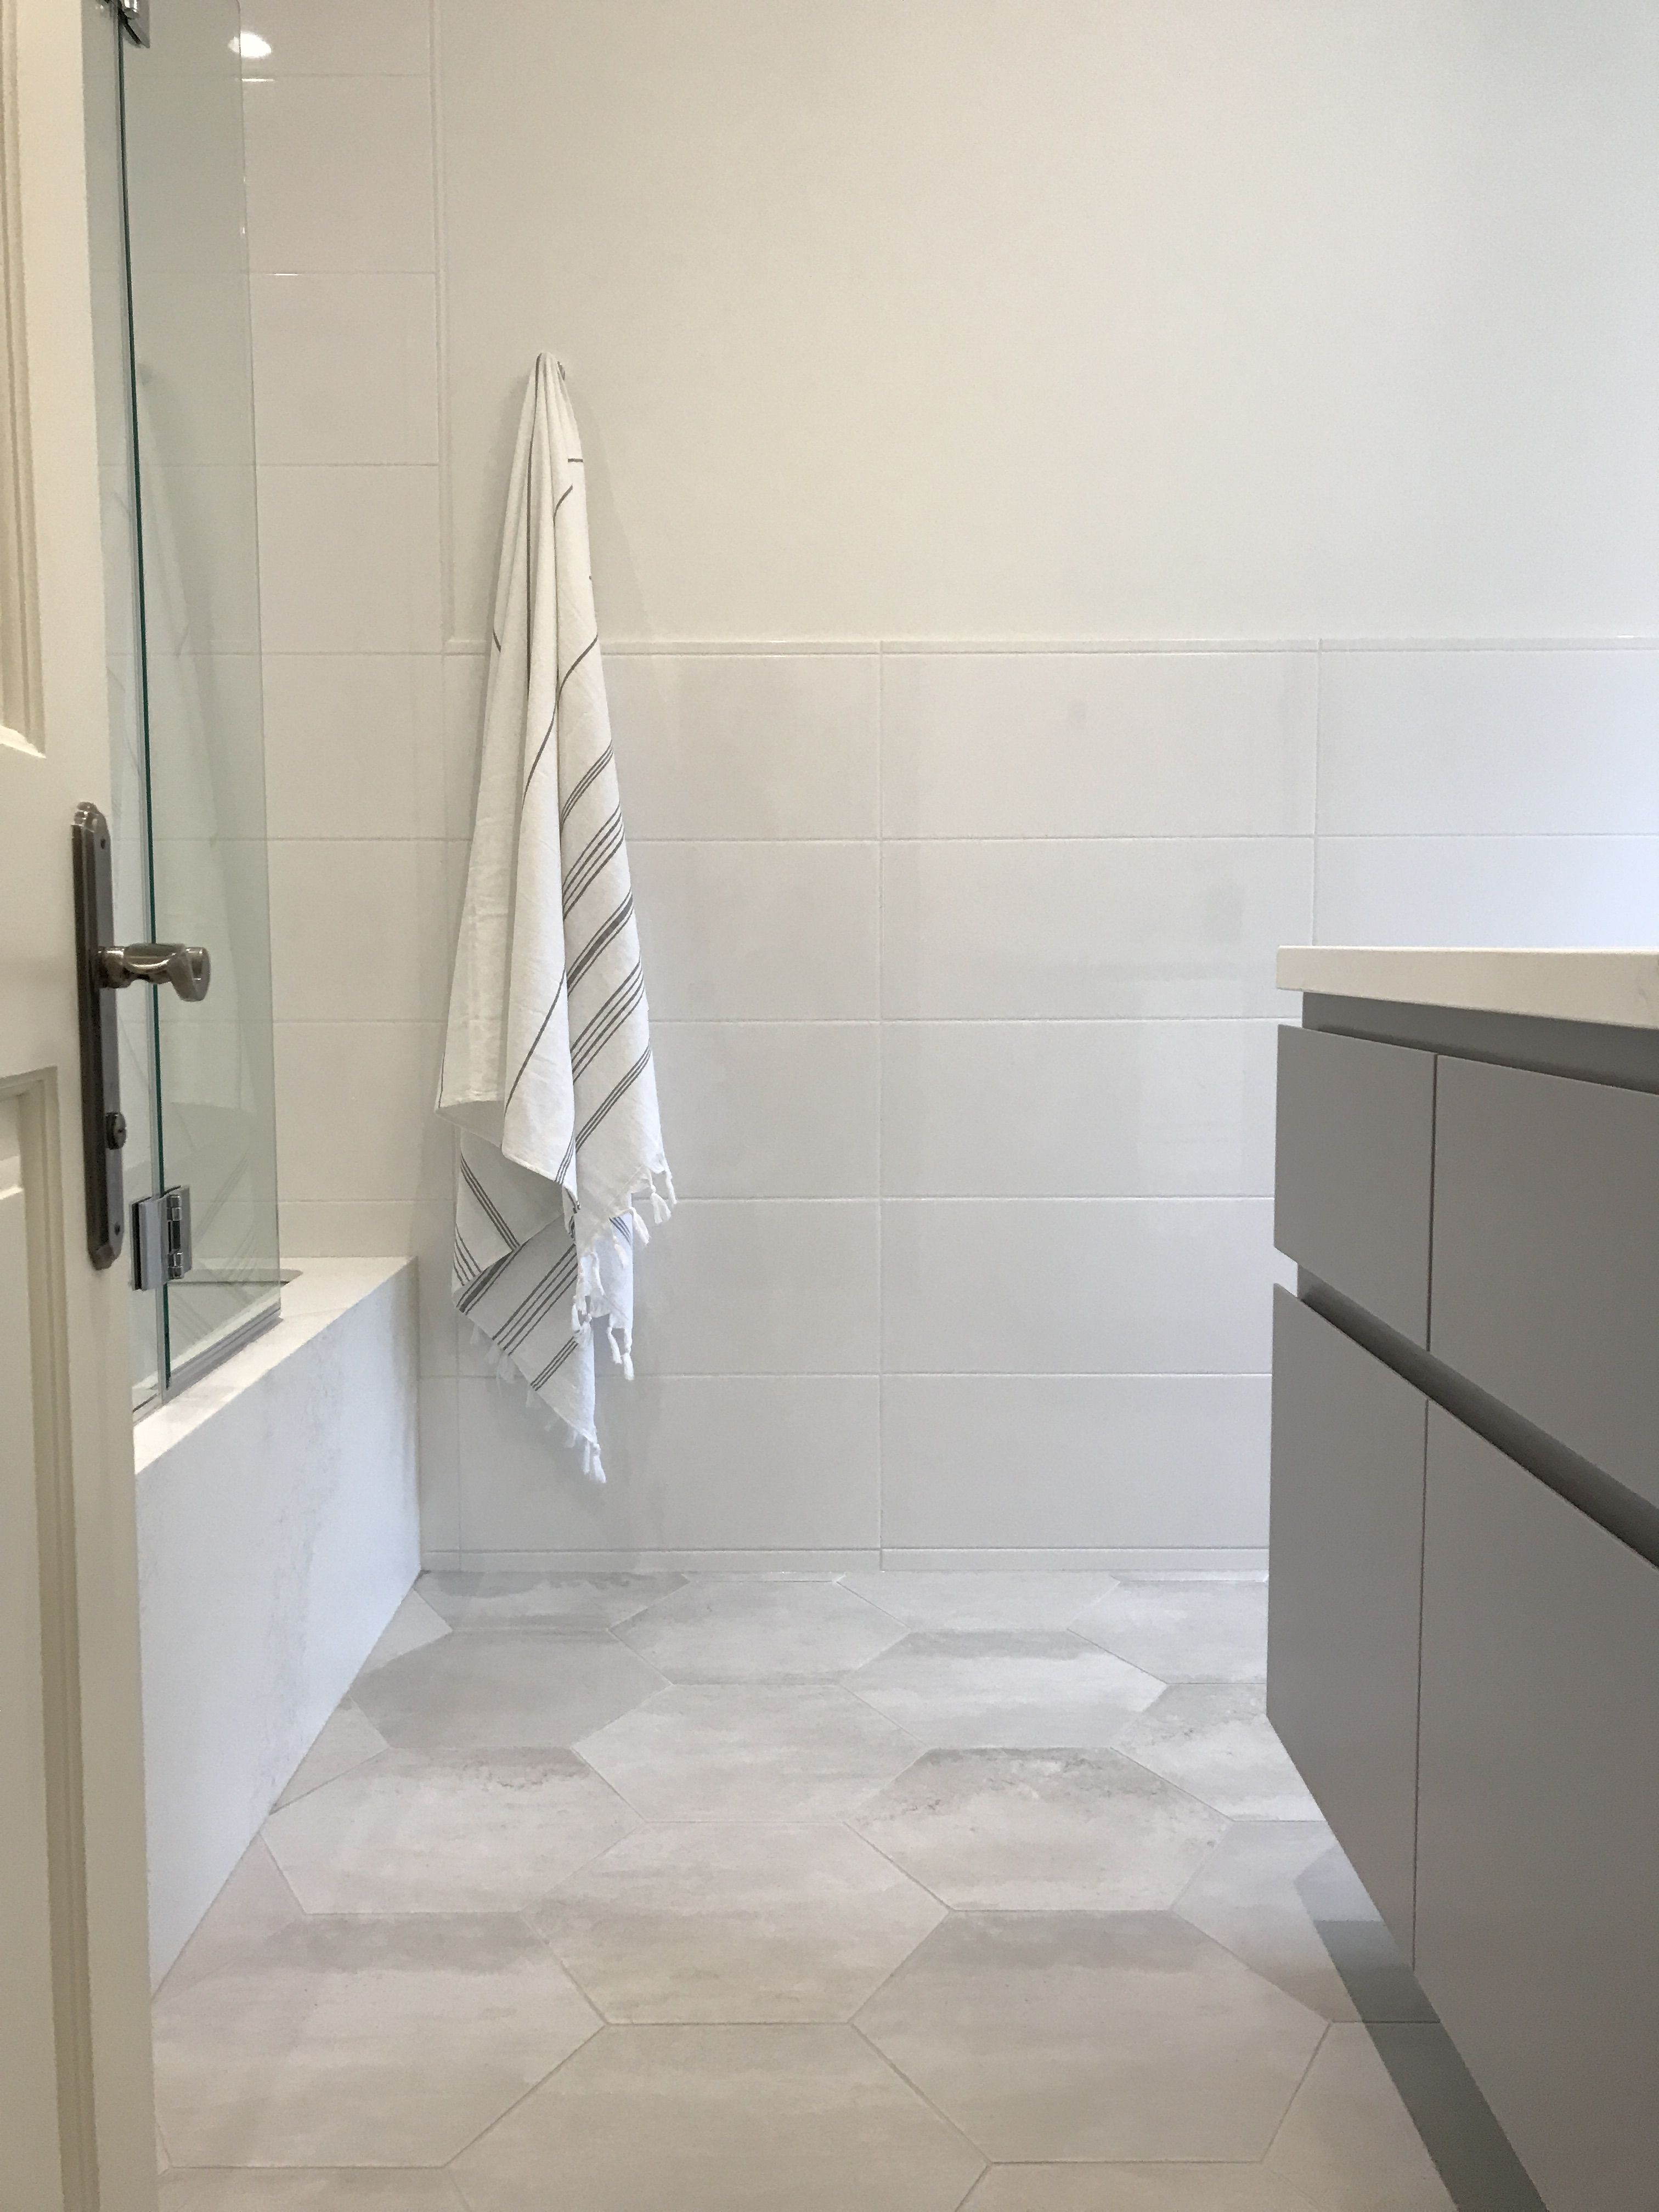 Wall Faucet Custom Vanity Grey Large White Subway Tile Hexagon Floor Tiles Recessed Medici White Bathroom Tiles Bathroom Wall Tile Bathroom Interior Design